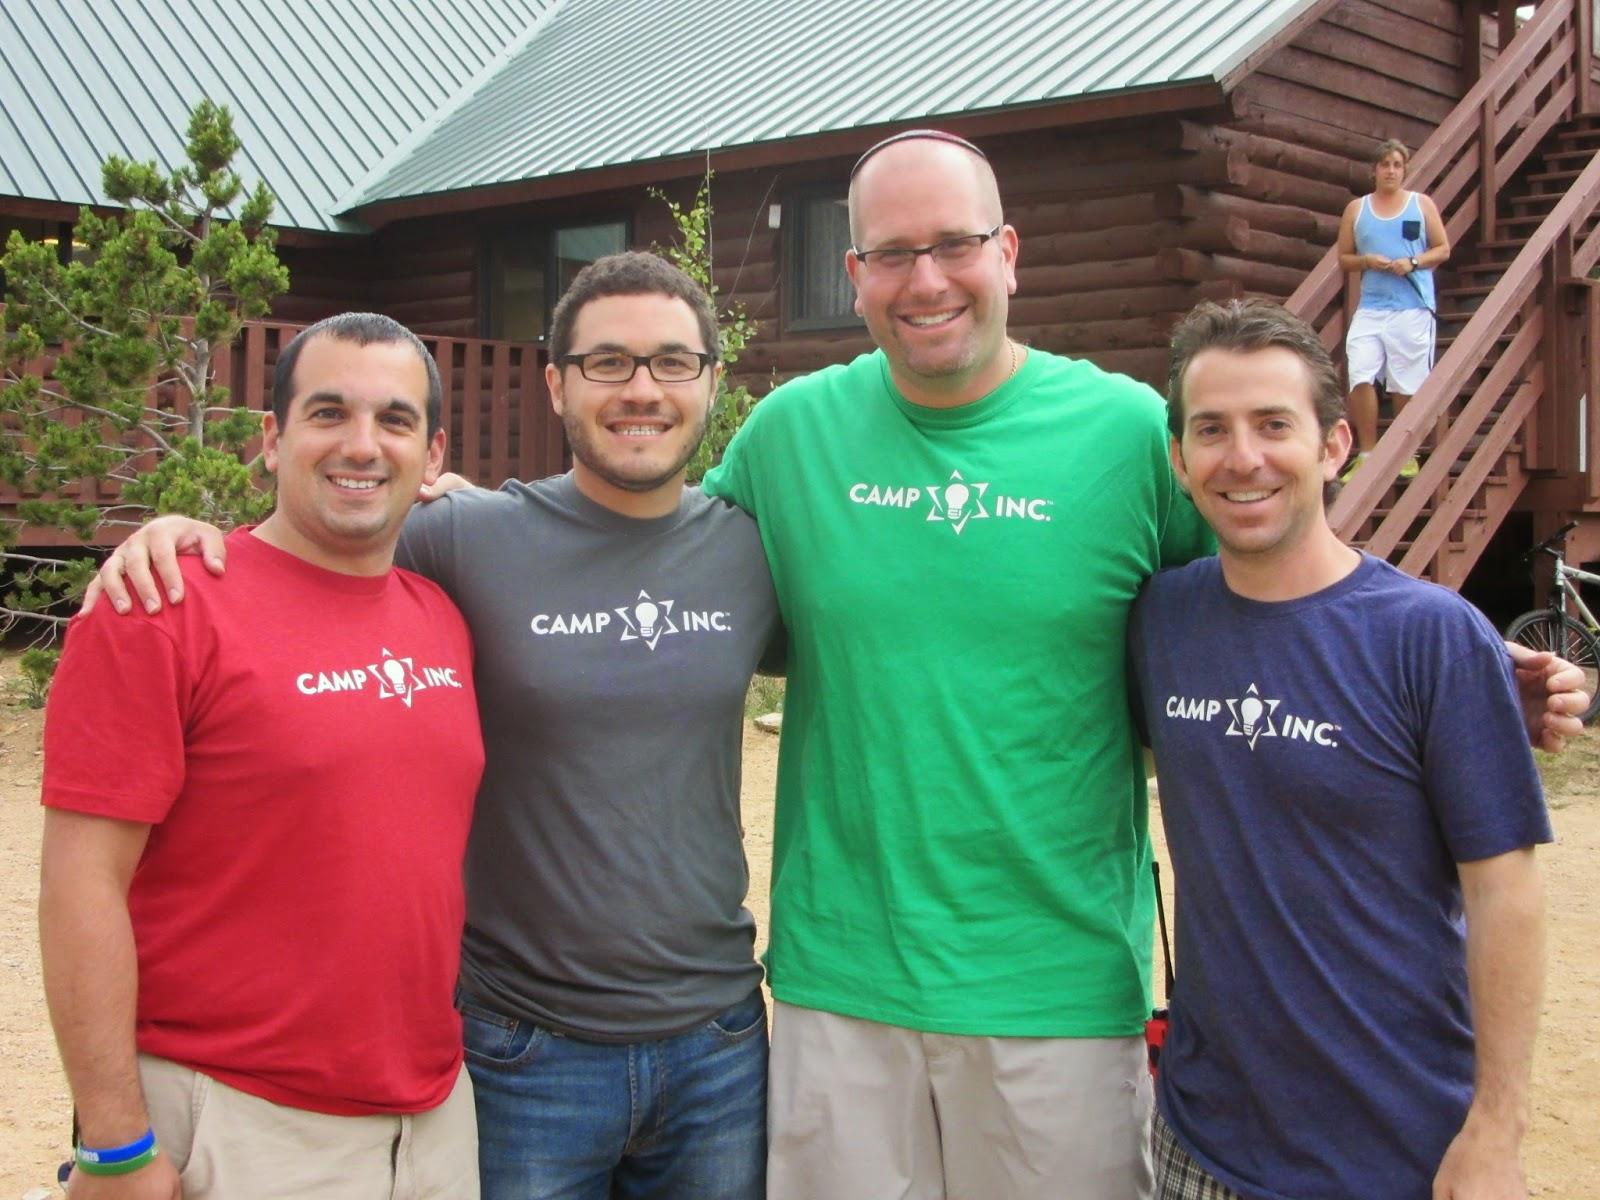 Rabbi Jason Miller with the leadership team of Camp Inc. (Dan Baer, Jonathan Lev and Josh Pierce)